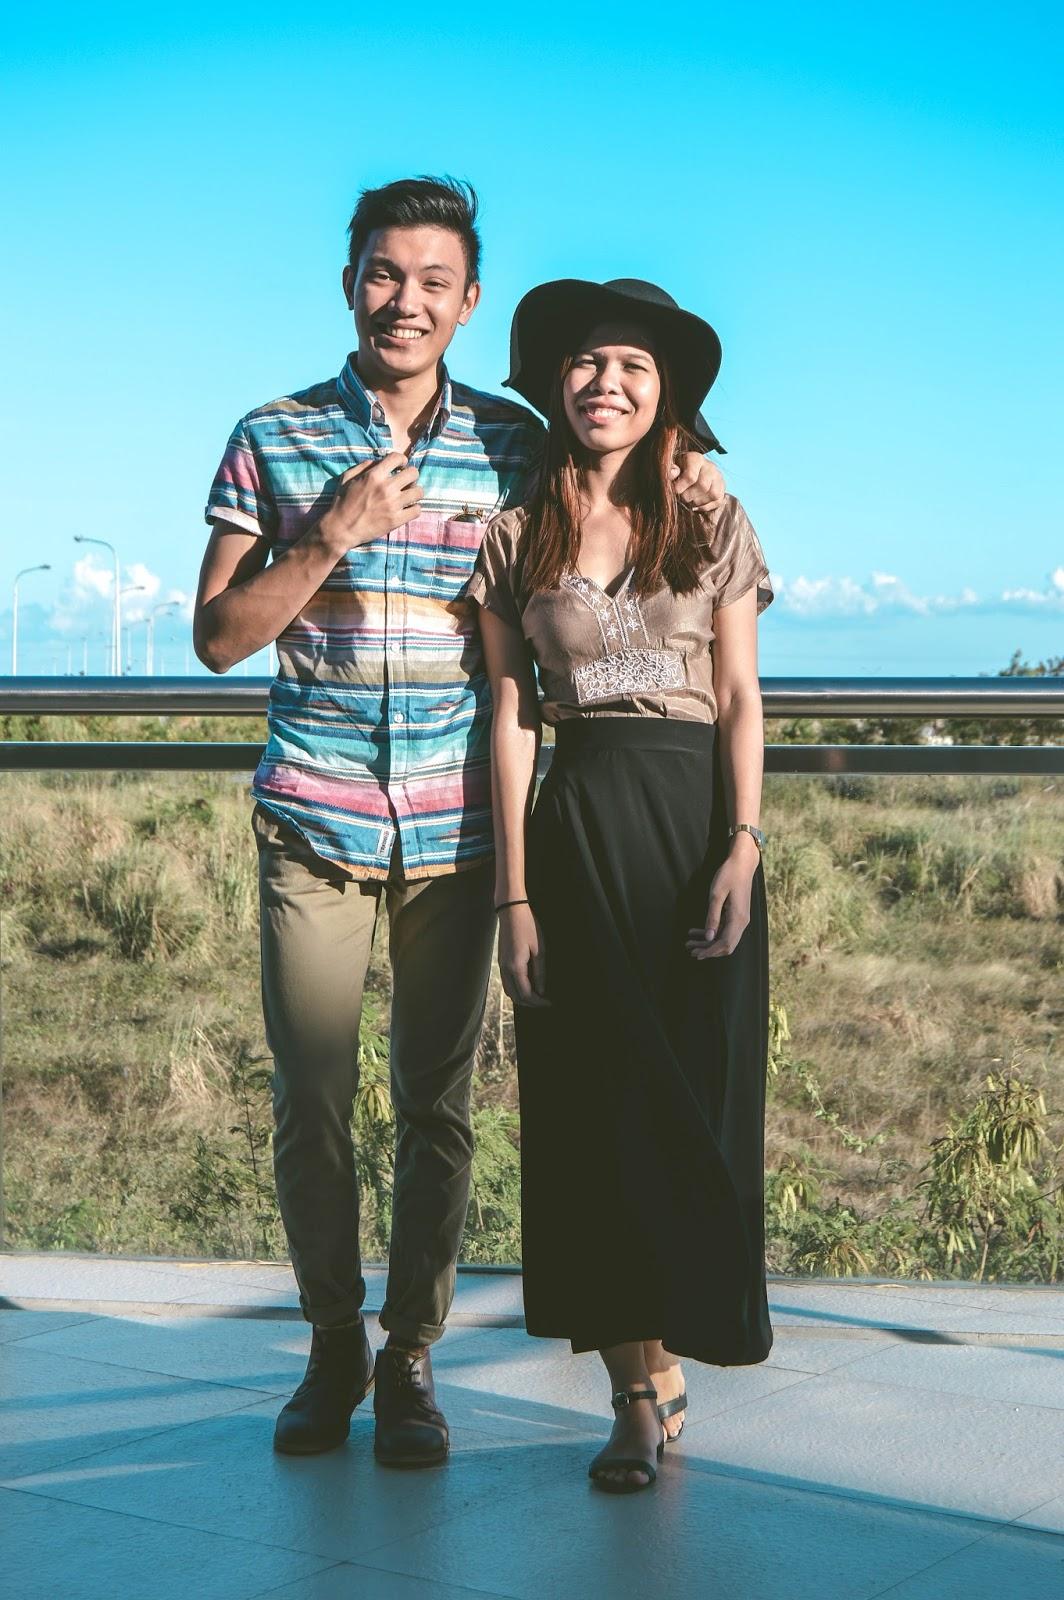 fashion blogger, style blogger, cebu blogger, cebu style blogger, blogger, filipina blogger, cebuana blogger, blogger collaboration, summer 2015, boho, bohemian, nested thoughts, the pablique, andrew pablico, katherine cutar, katherine anne cutar, katherineanika, katherine annika